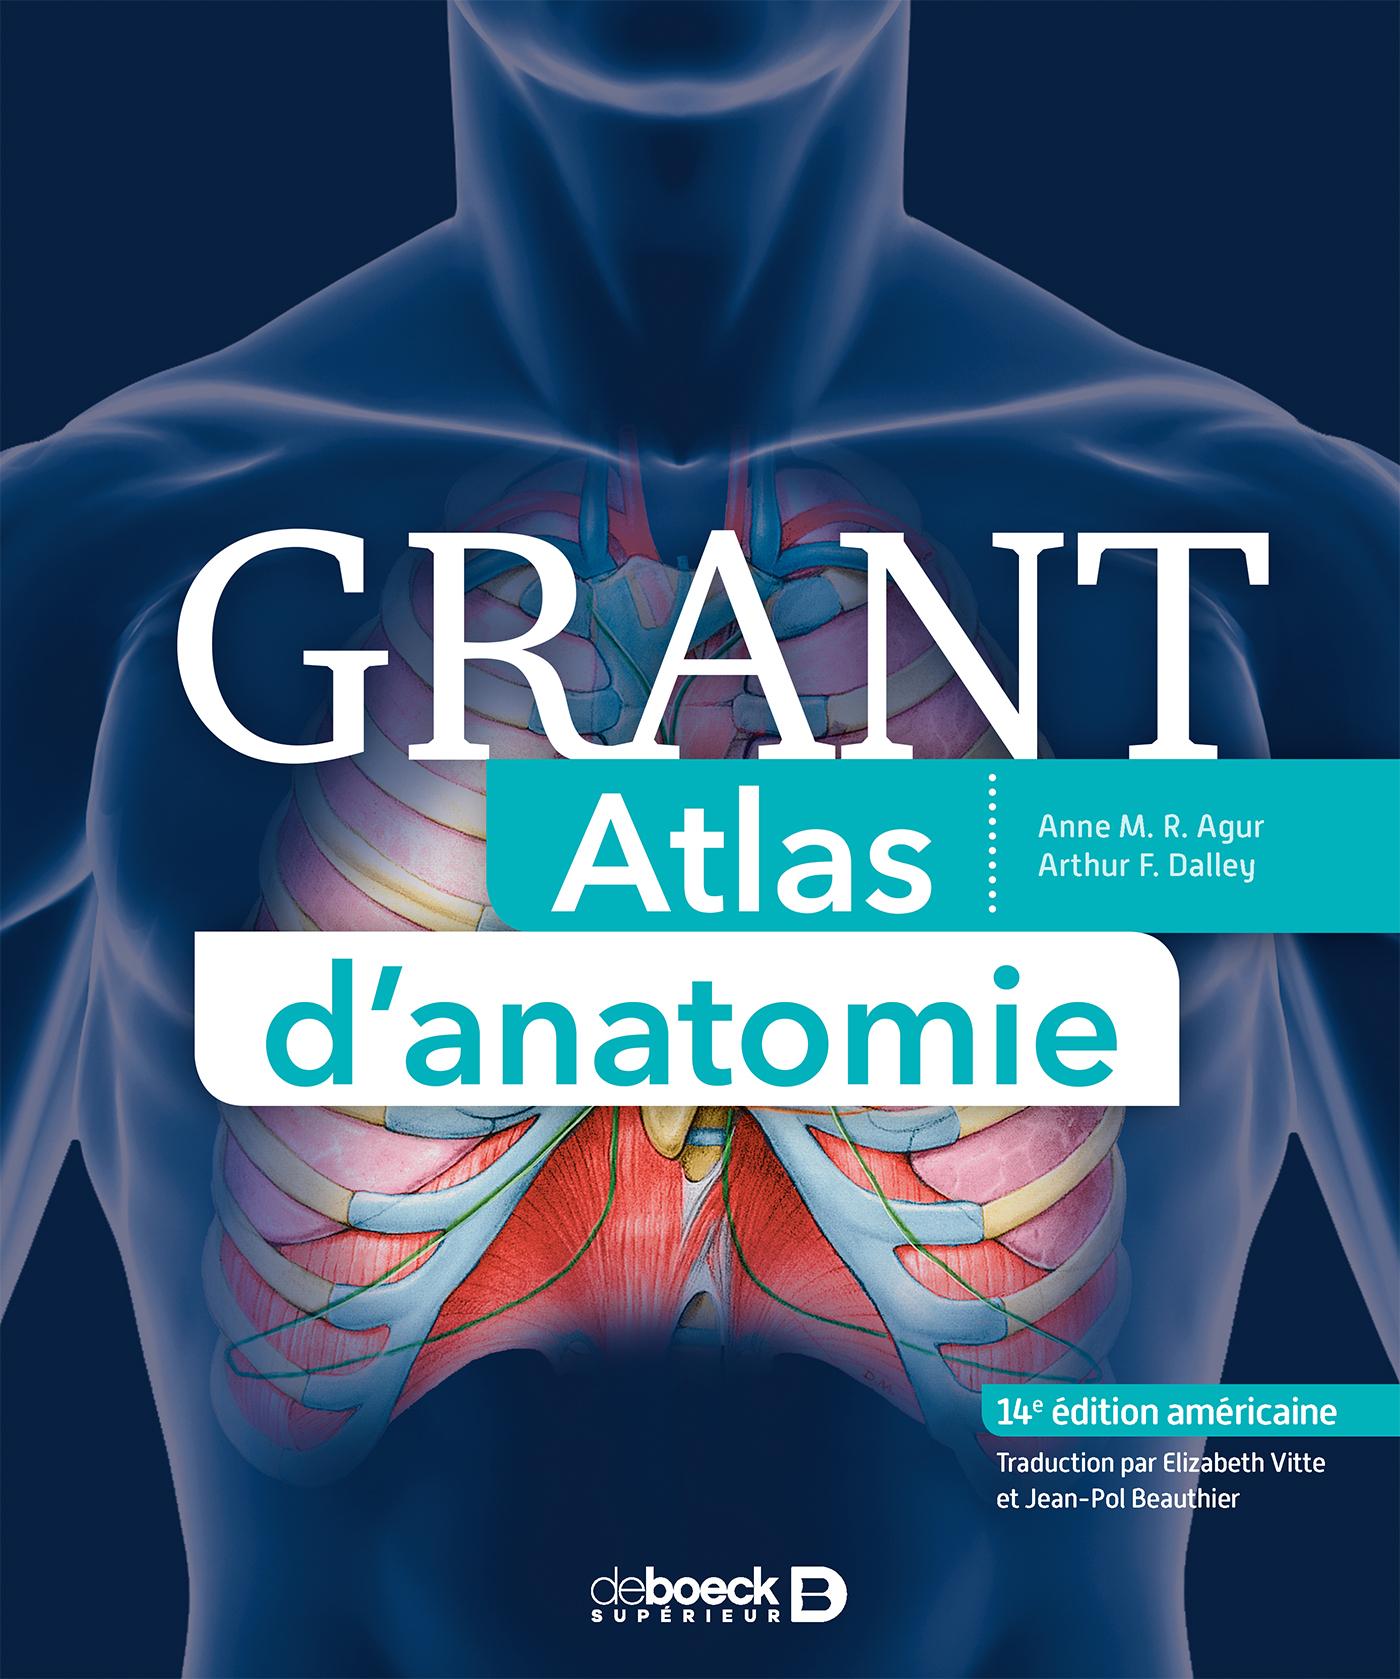 GRANT ATLAS D'ANATOMIE